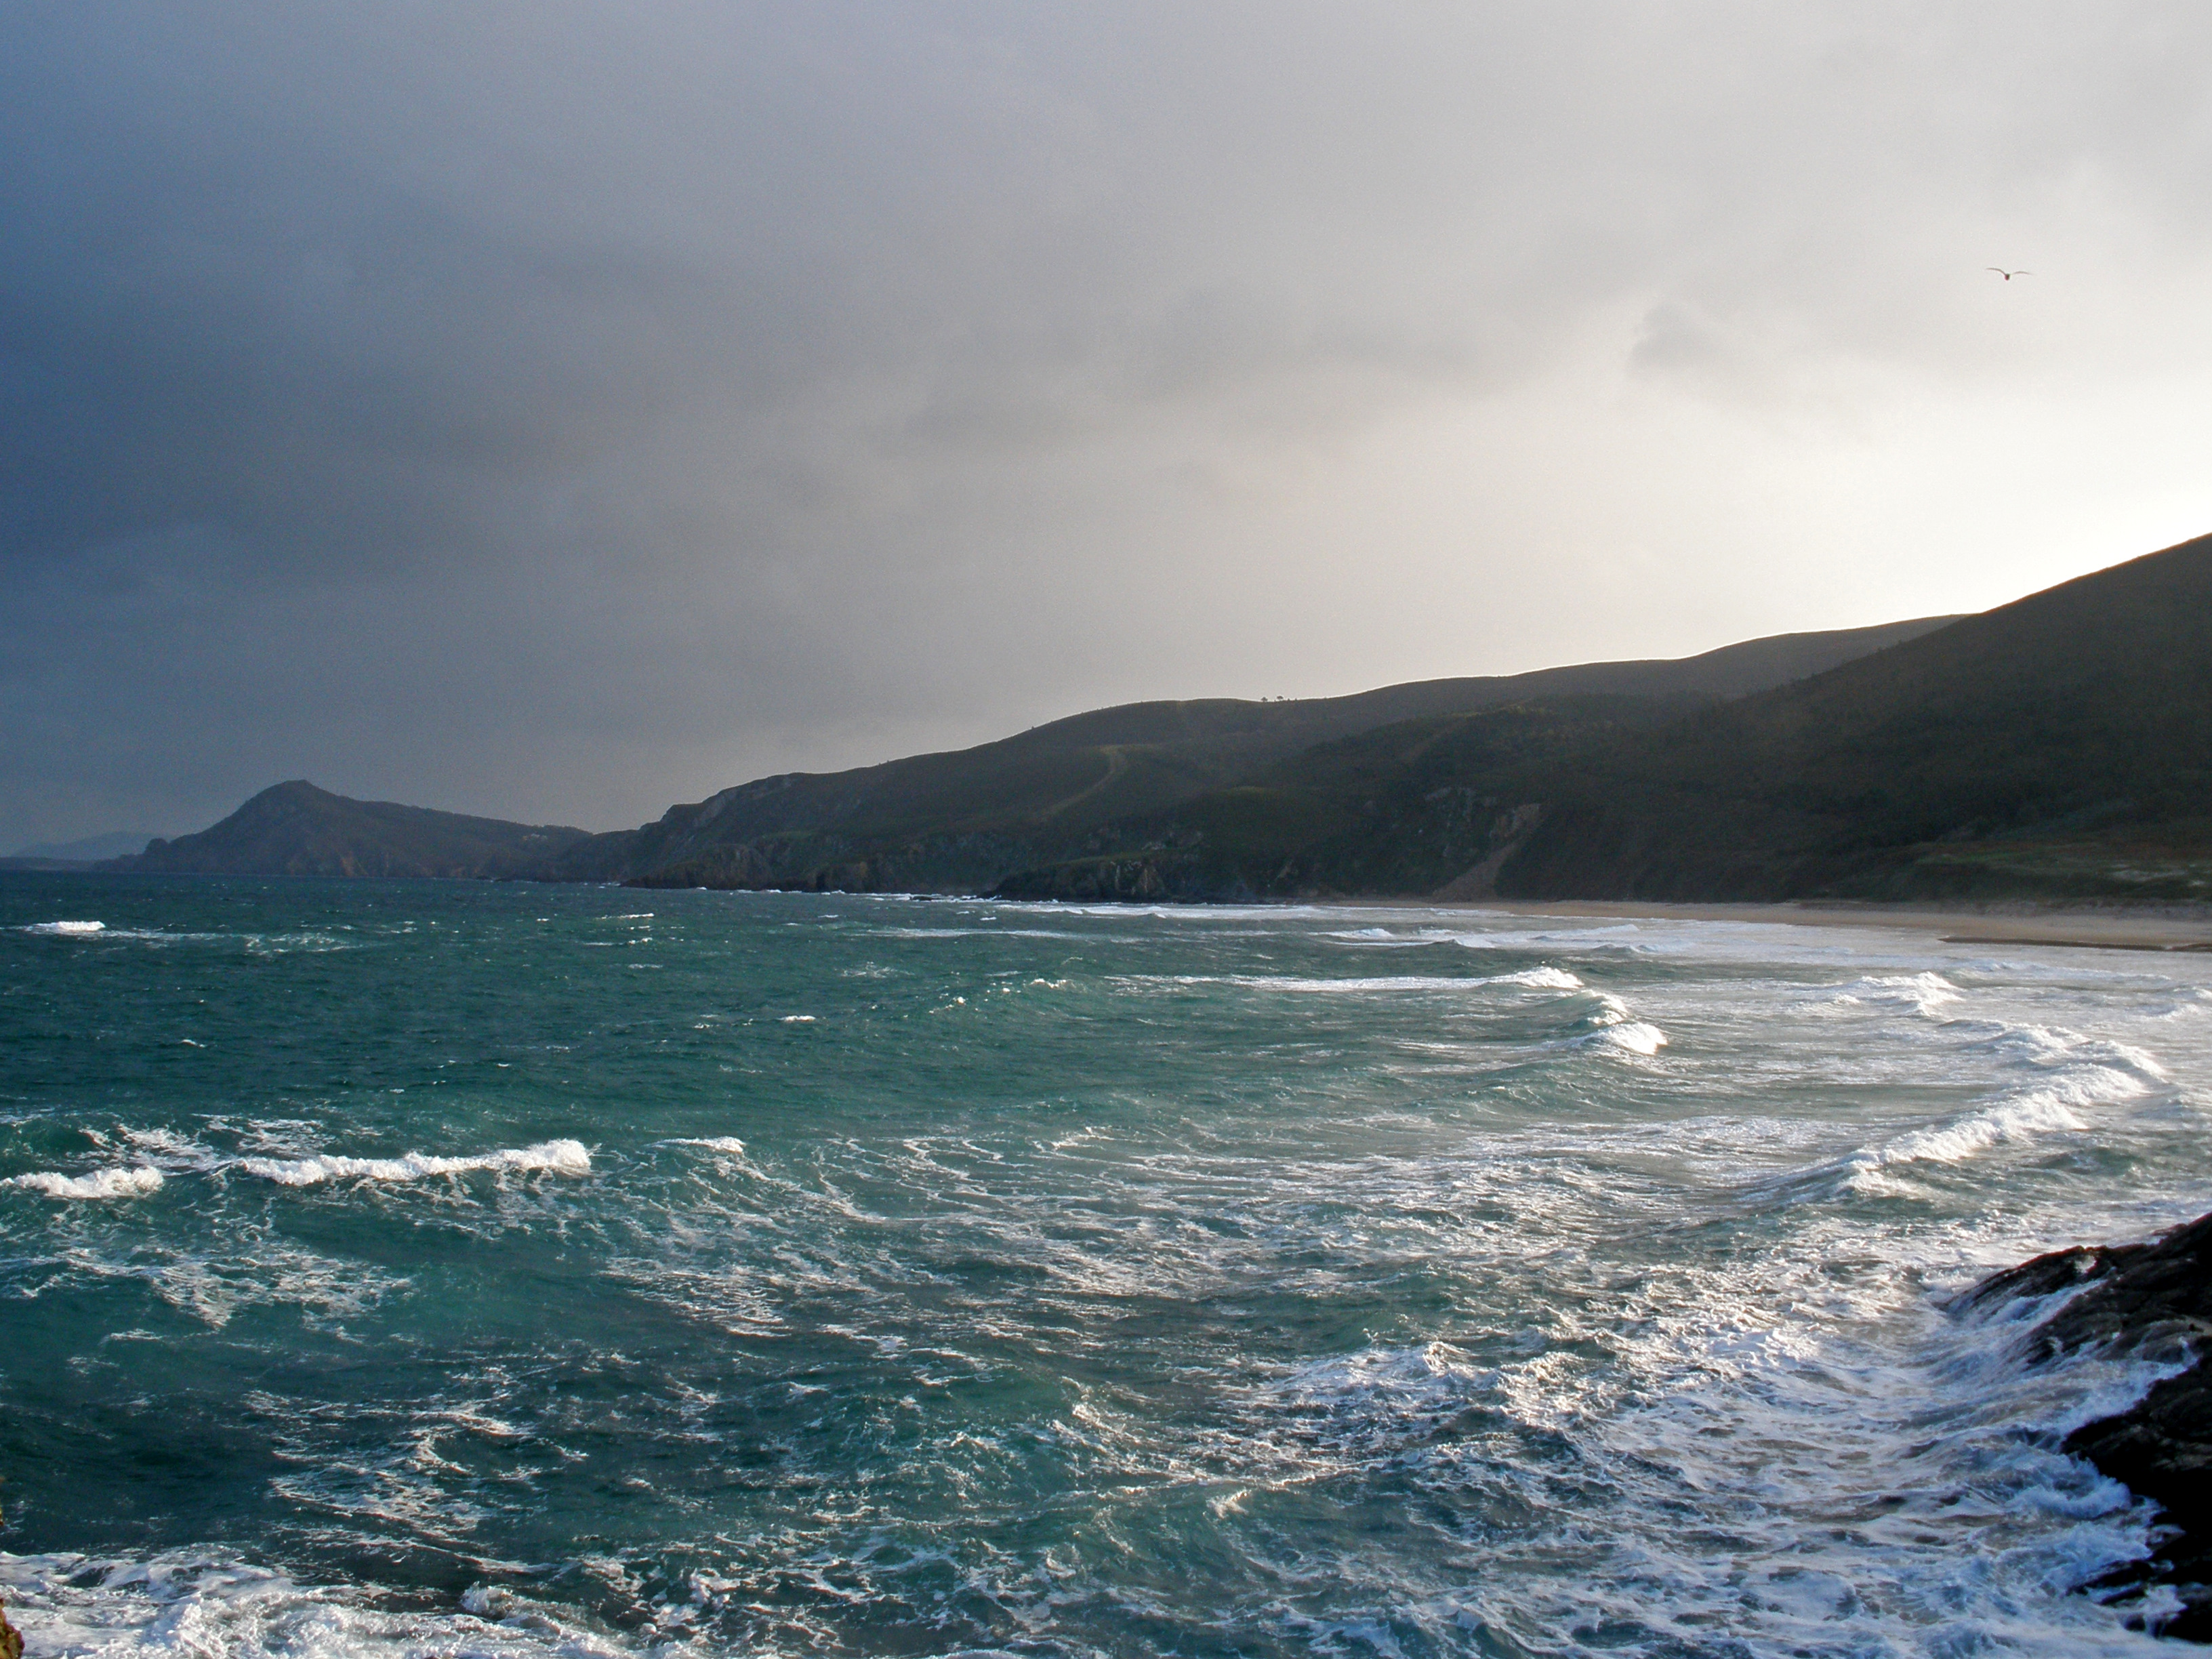 Foto playa As Fontes. Ponzos cobalto